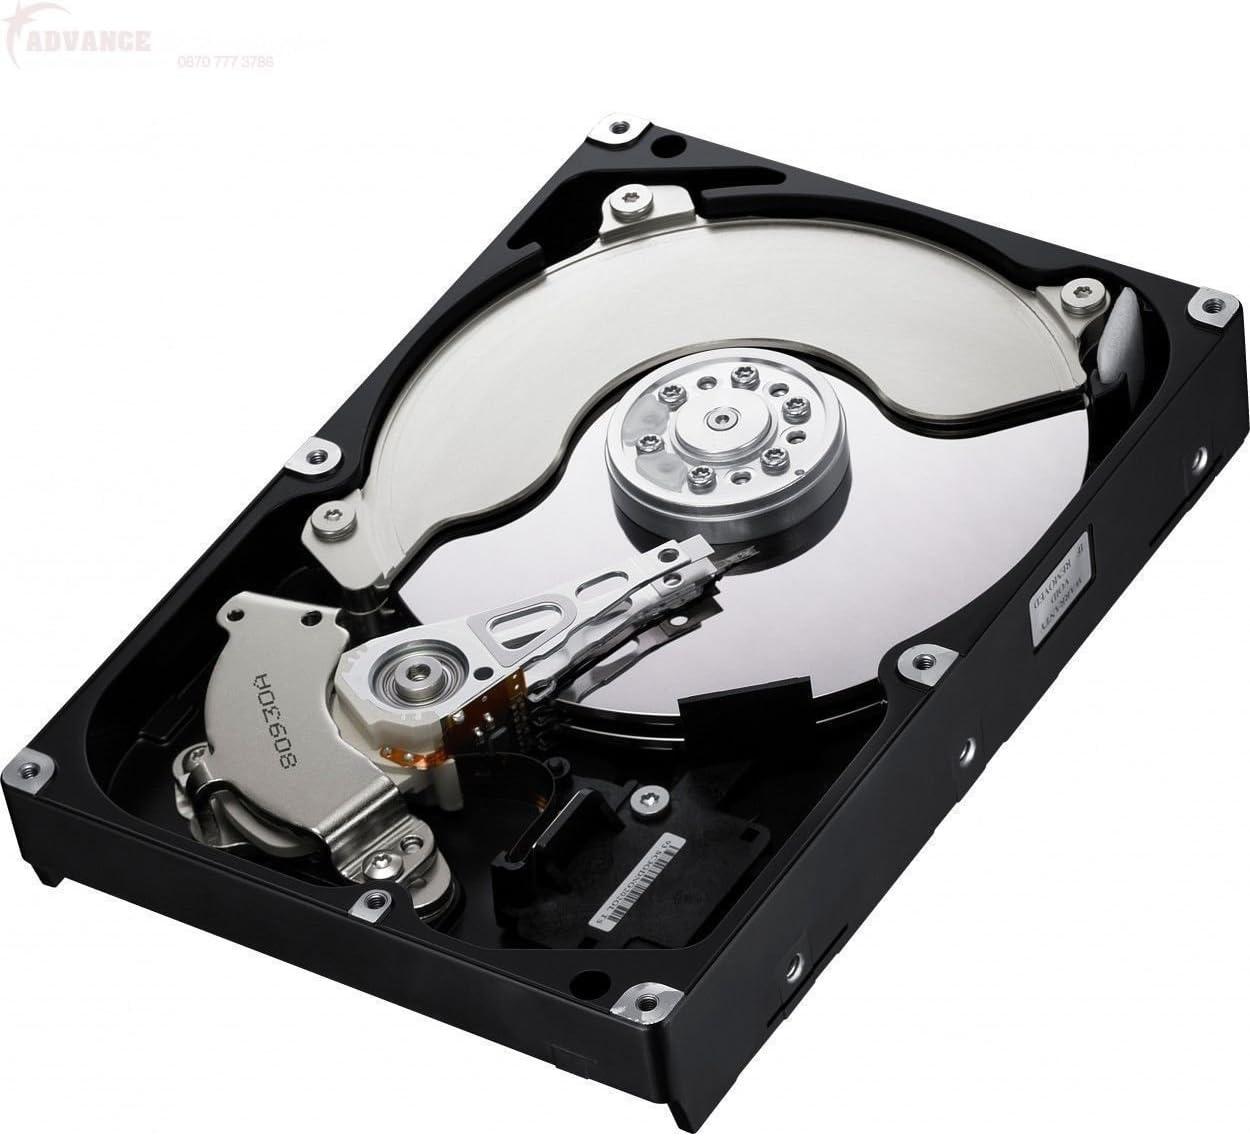 CCTV Desktop DVR Sata 3.5 Internal Hard Drive HDD 7200rpm HITACHI 2000GB 2TB